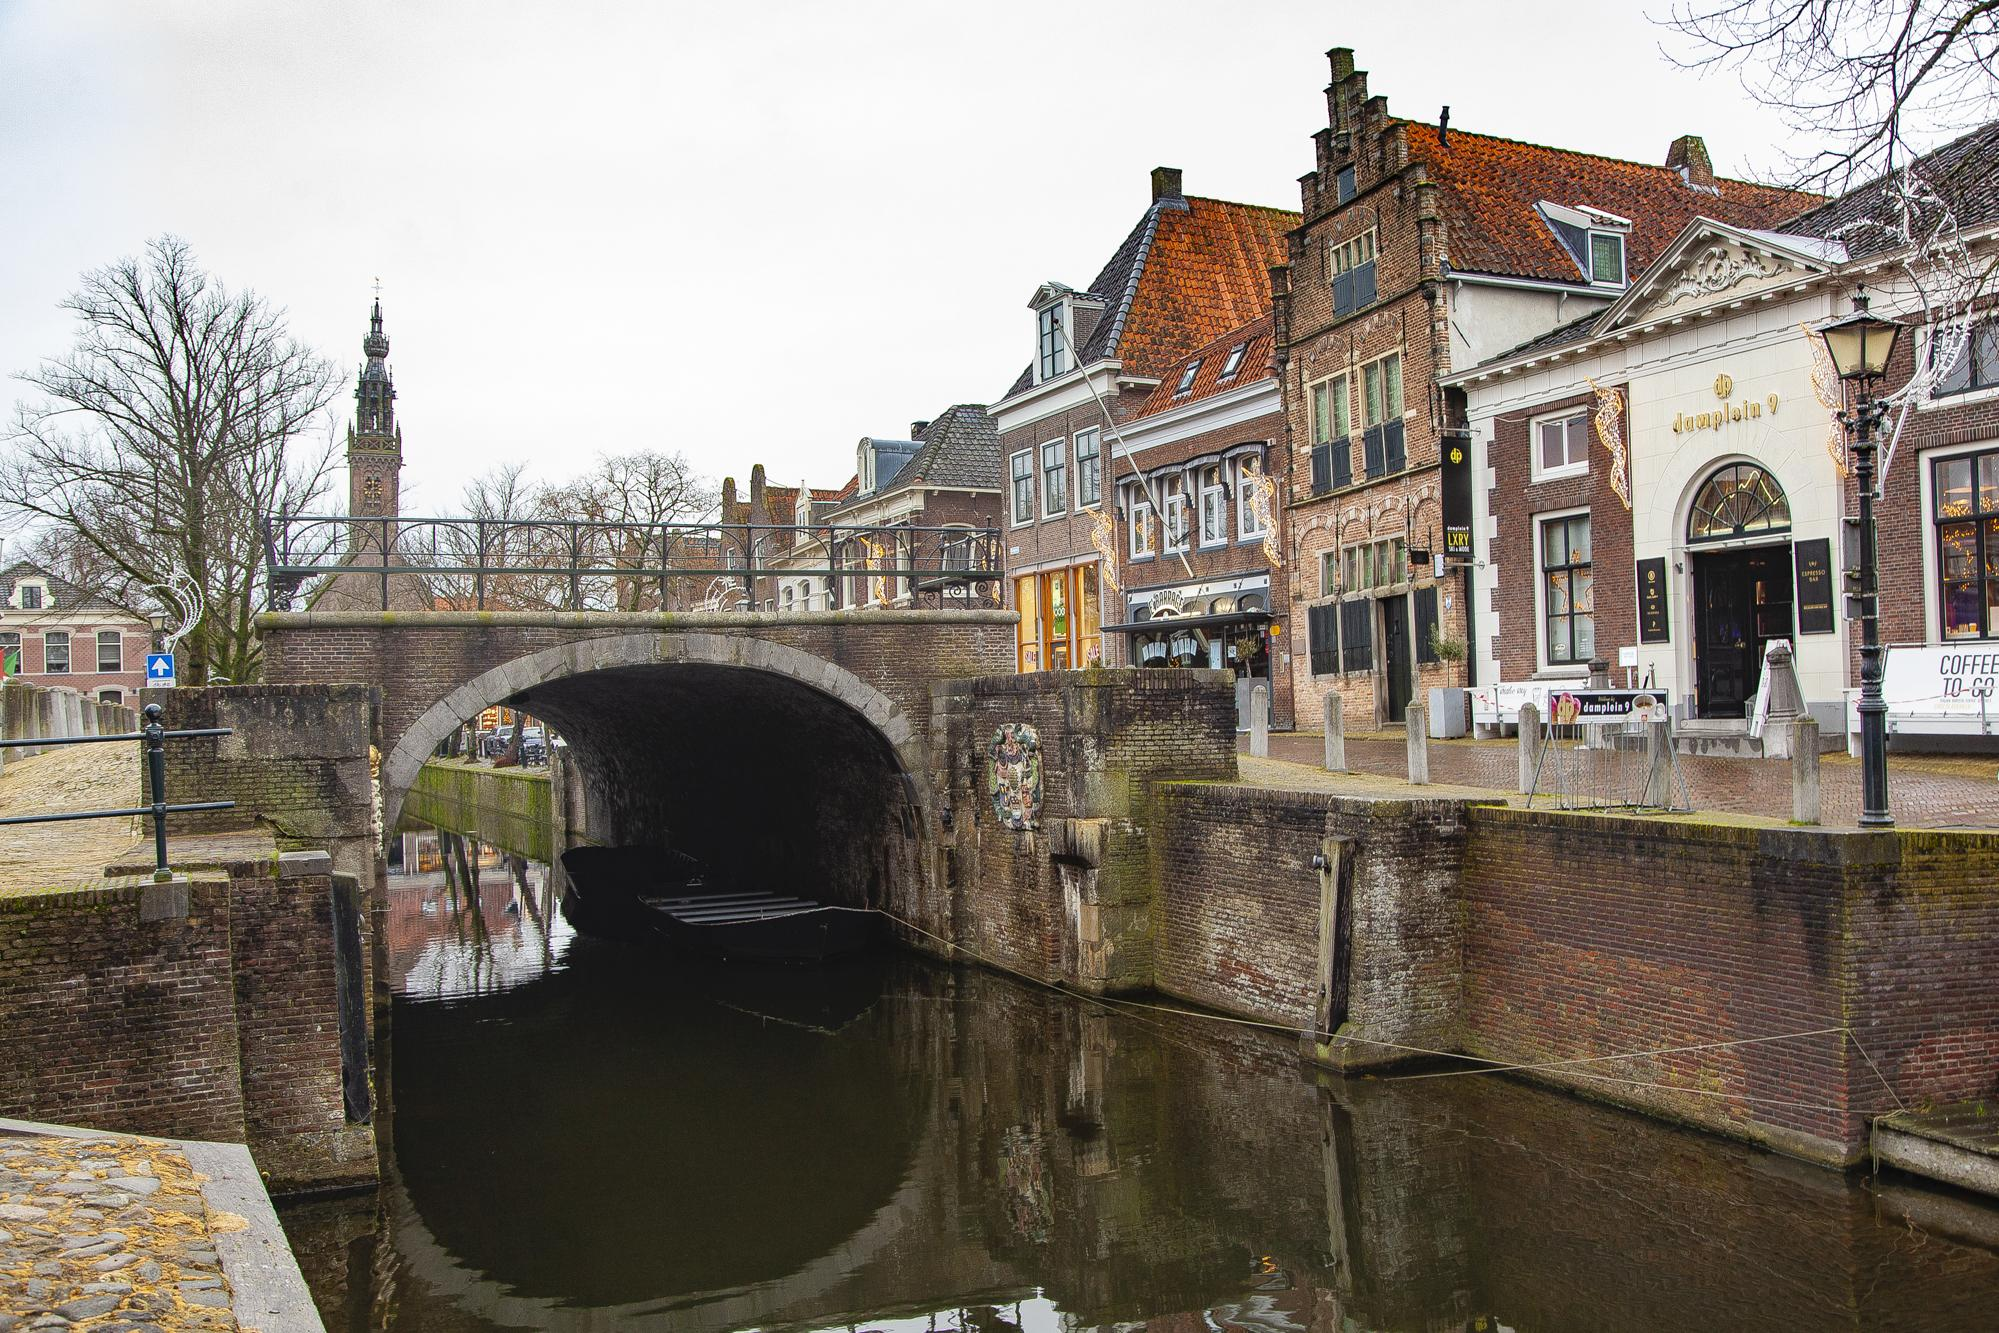 Monumentale Damsluis Edam krijgt flinke opknapbeurt; ruim 200 jaar oude waterkering terug in originele staat